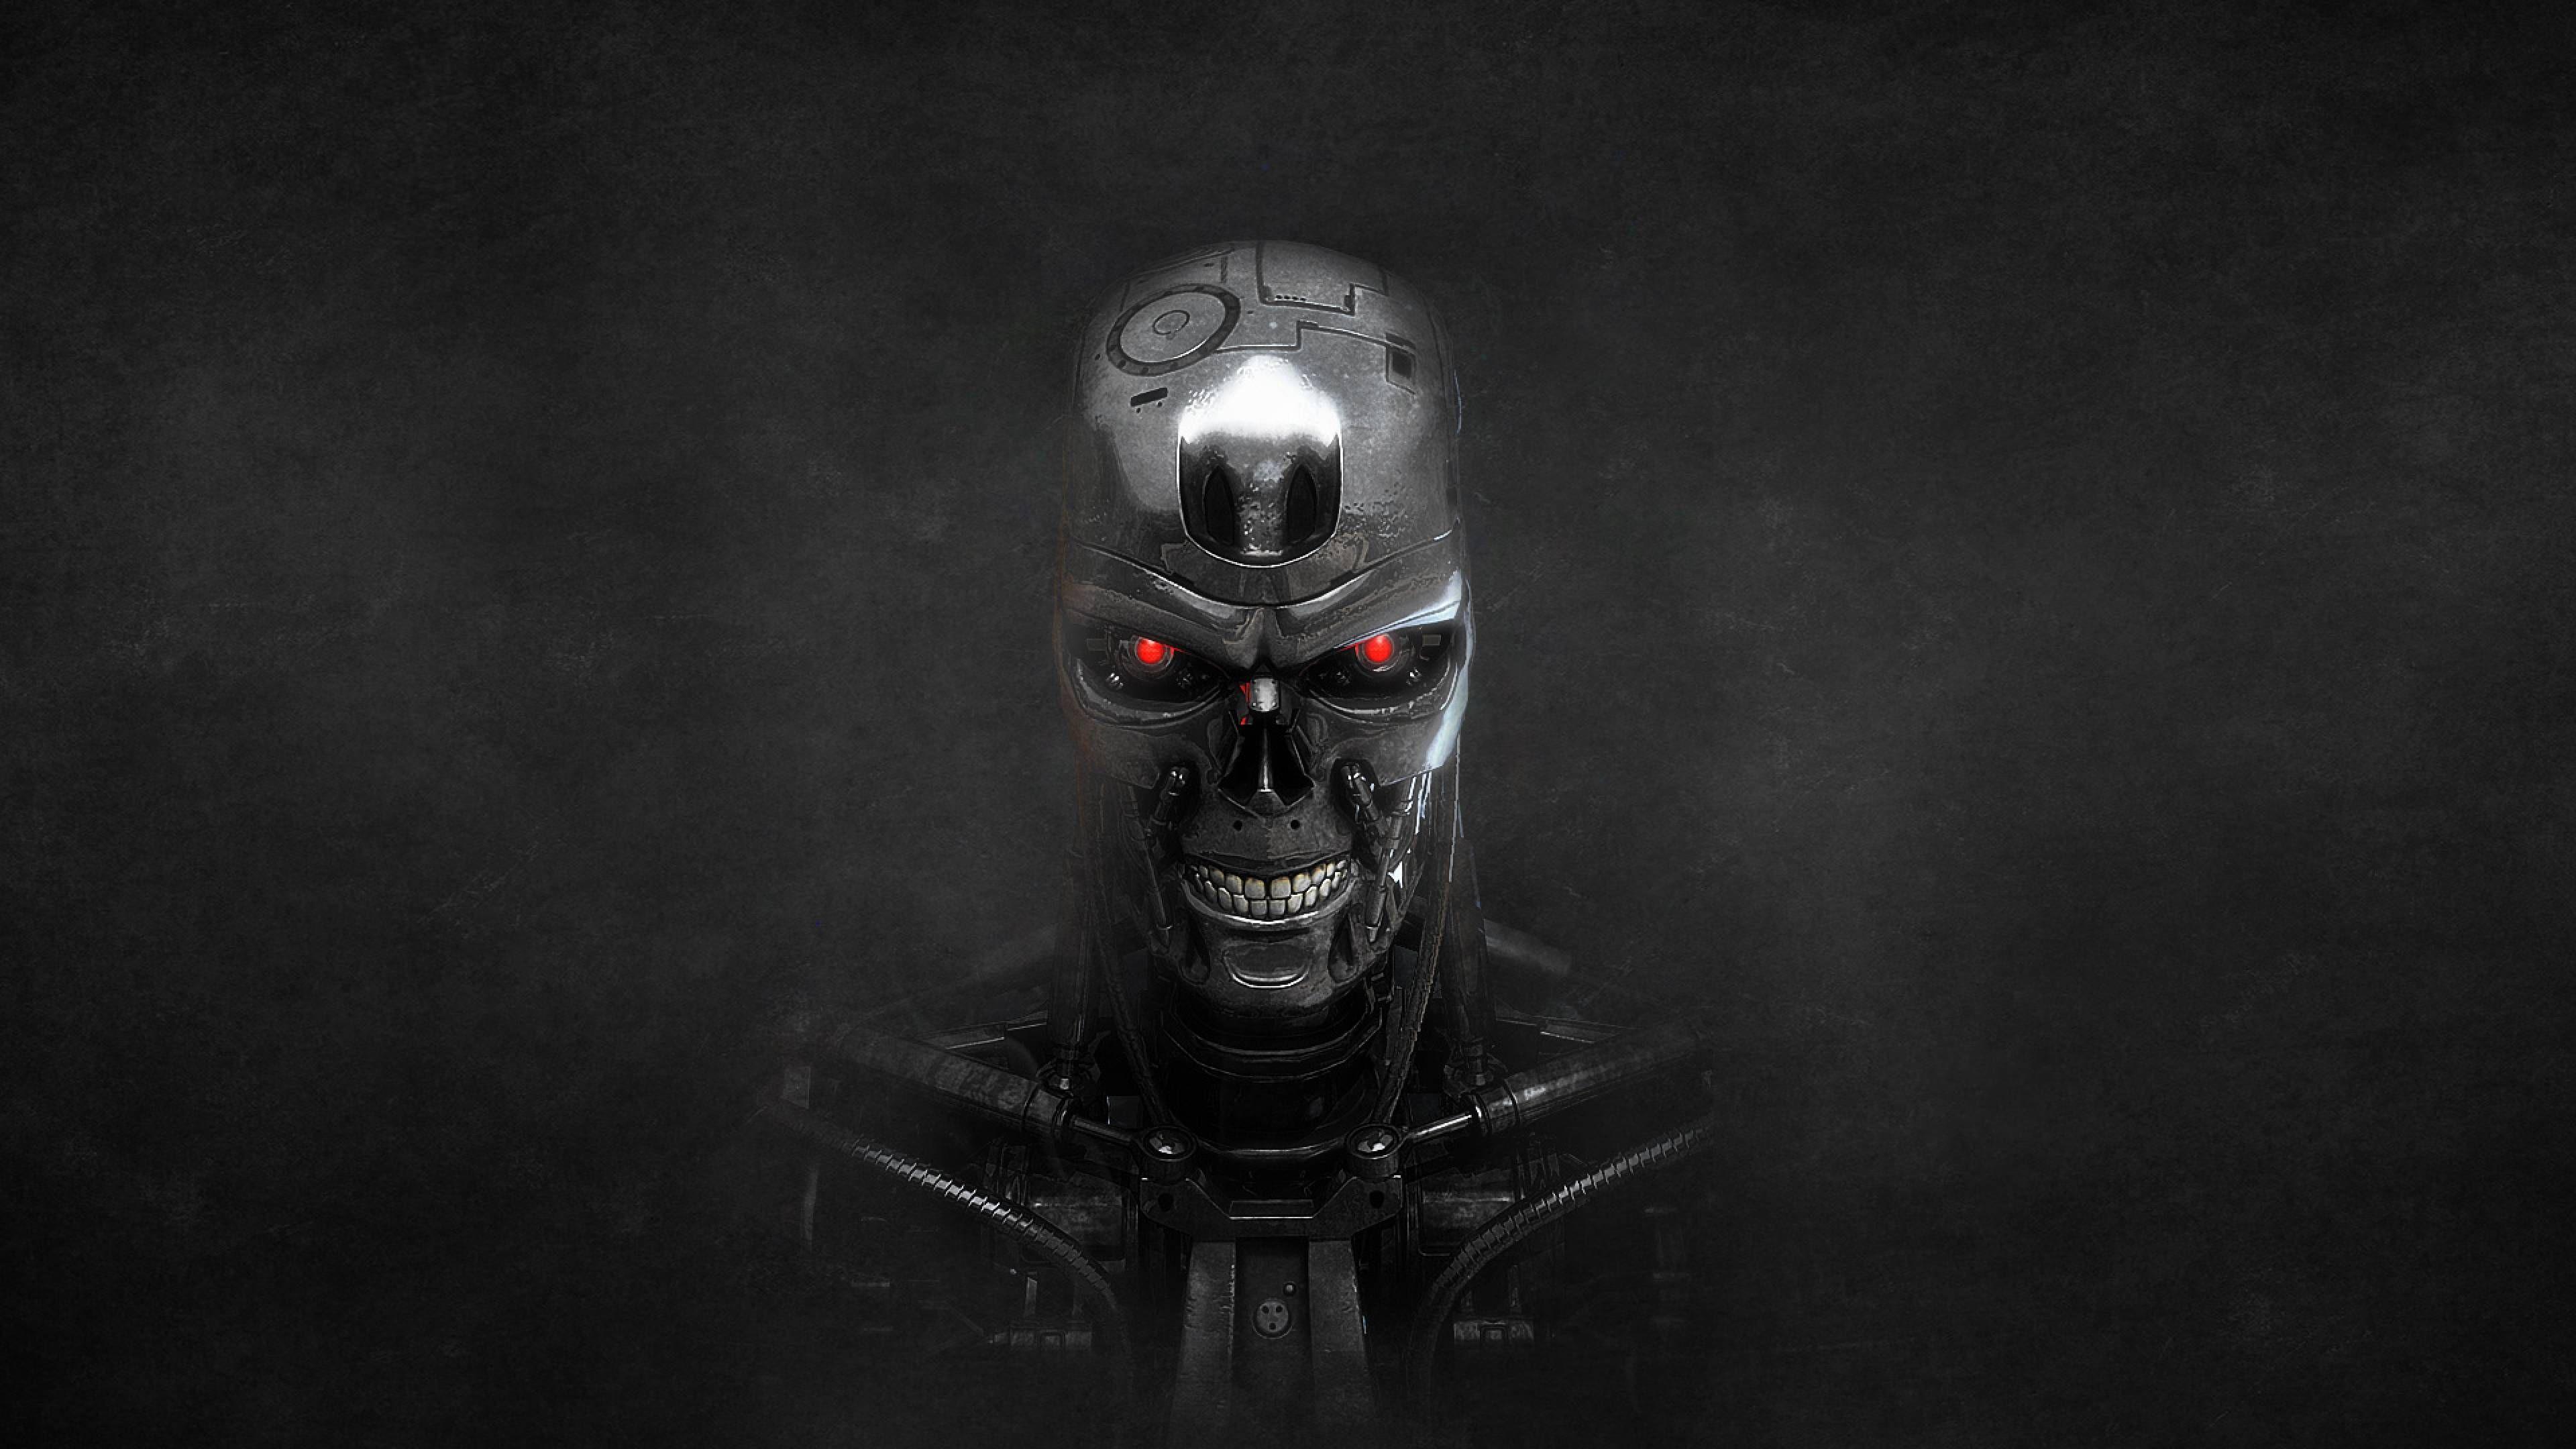 Dark Smoky TerminatorThemed Wallpaper. Hd backgrounds